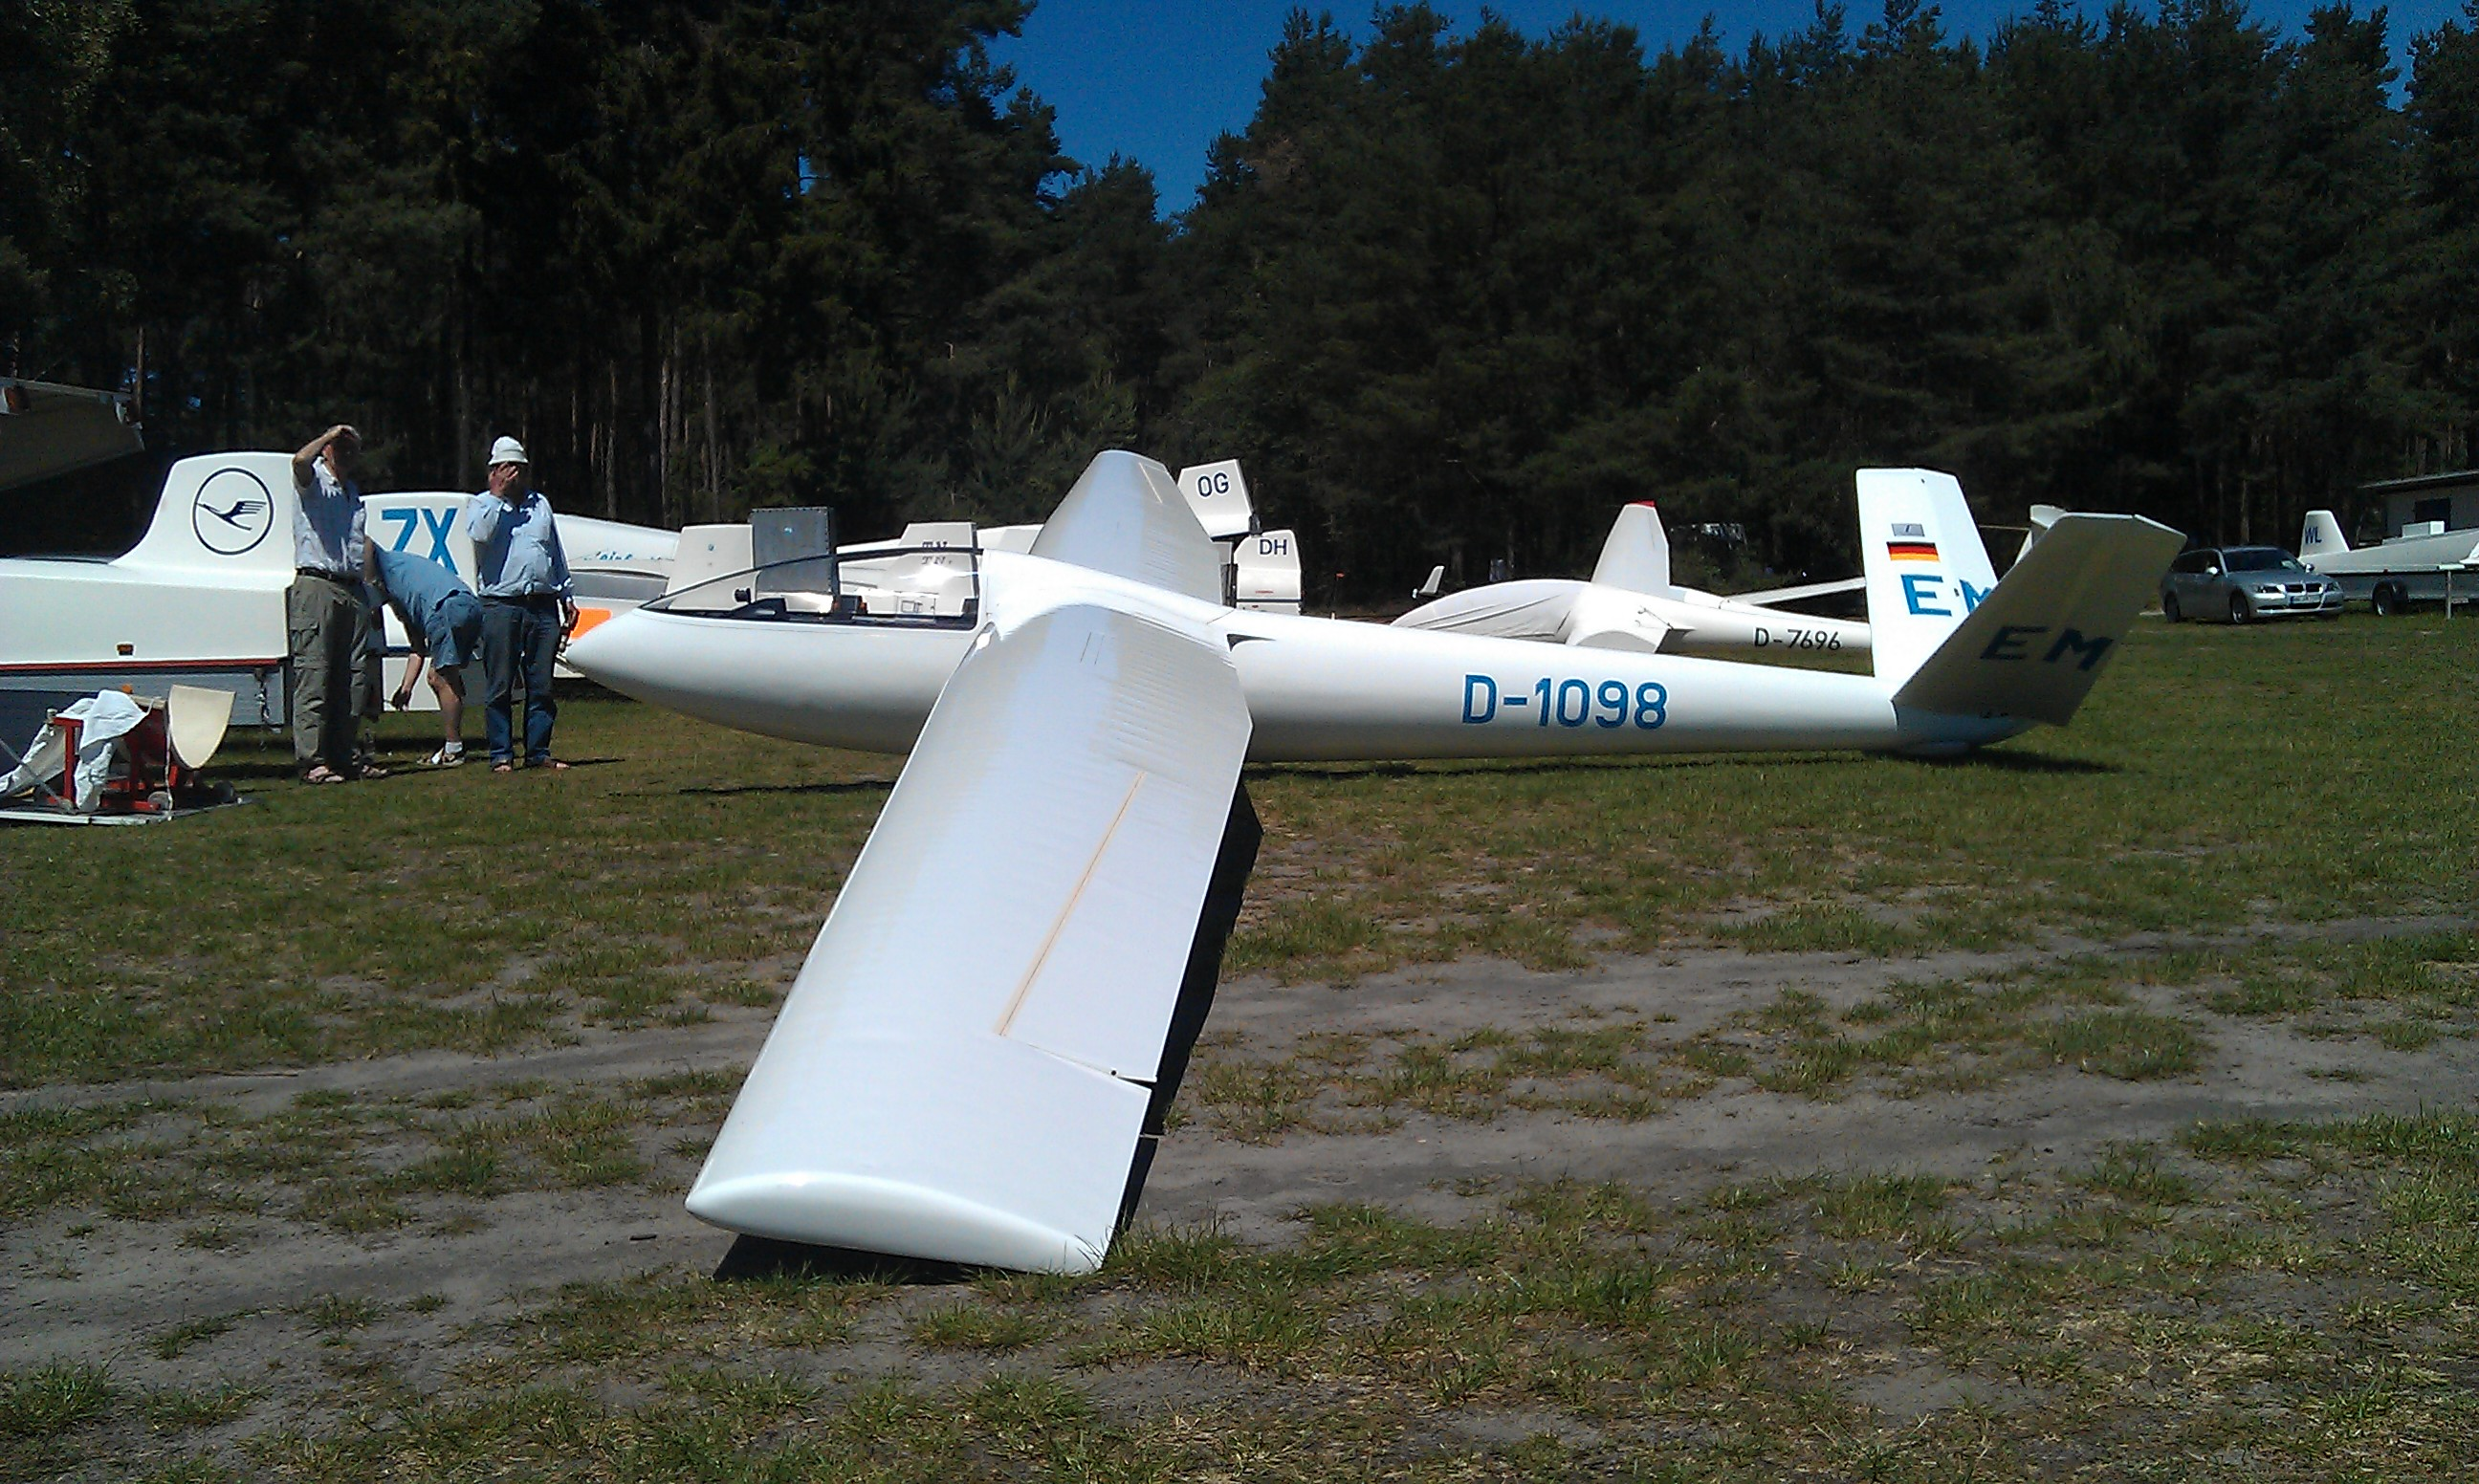 Privatflugzeuge Lsv Schneverdingen